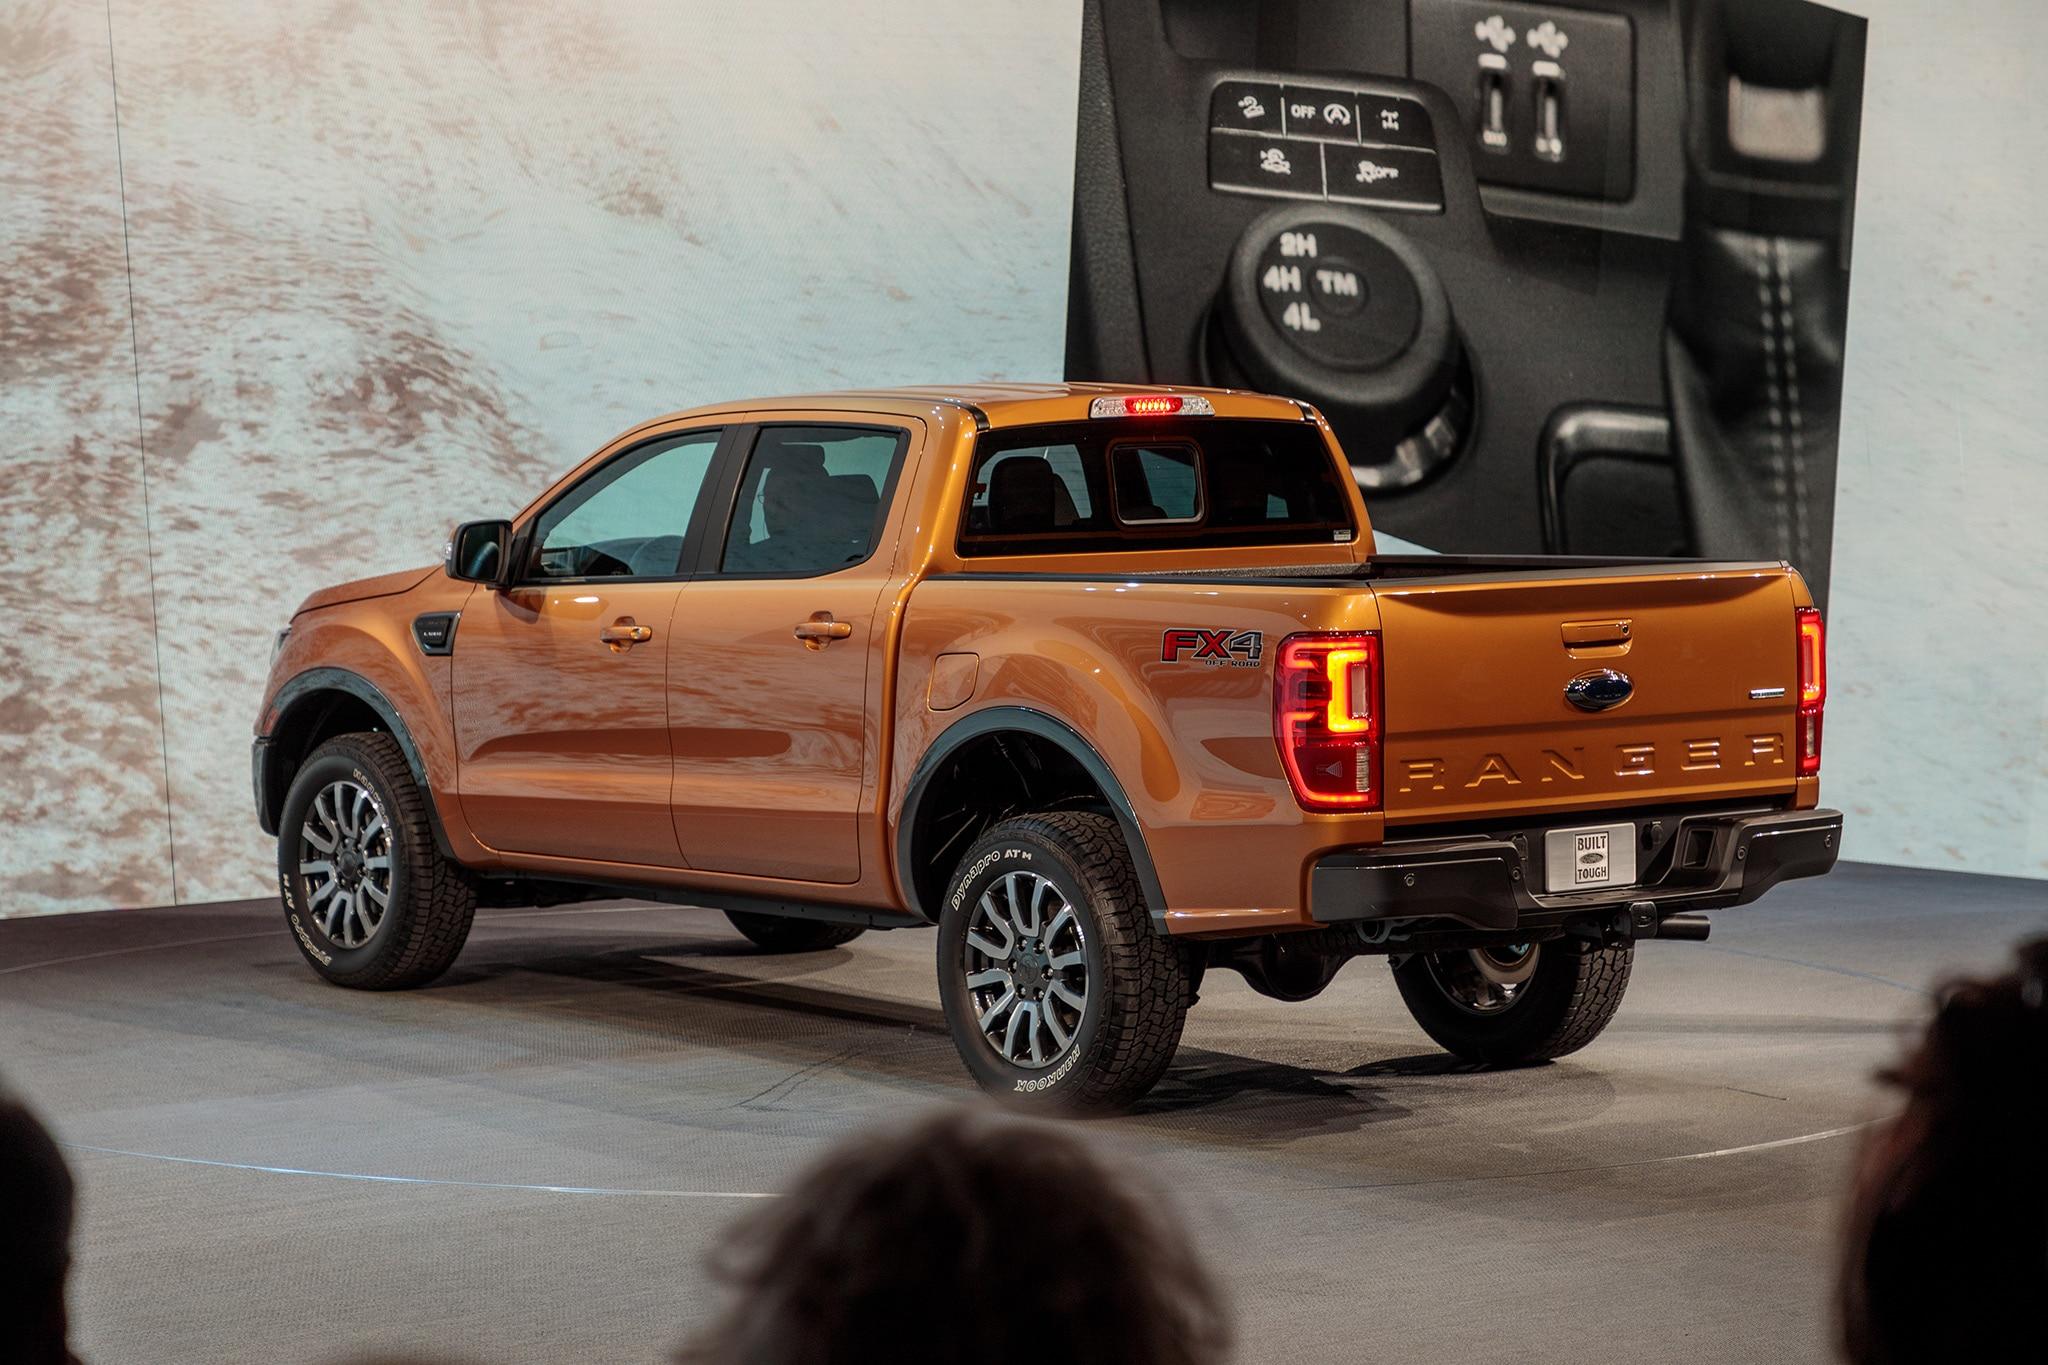 2019 Ford Ranger Lariat FX4 19 - Motor Trend en Español